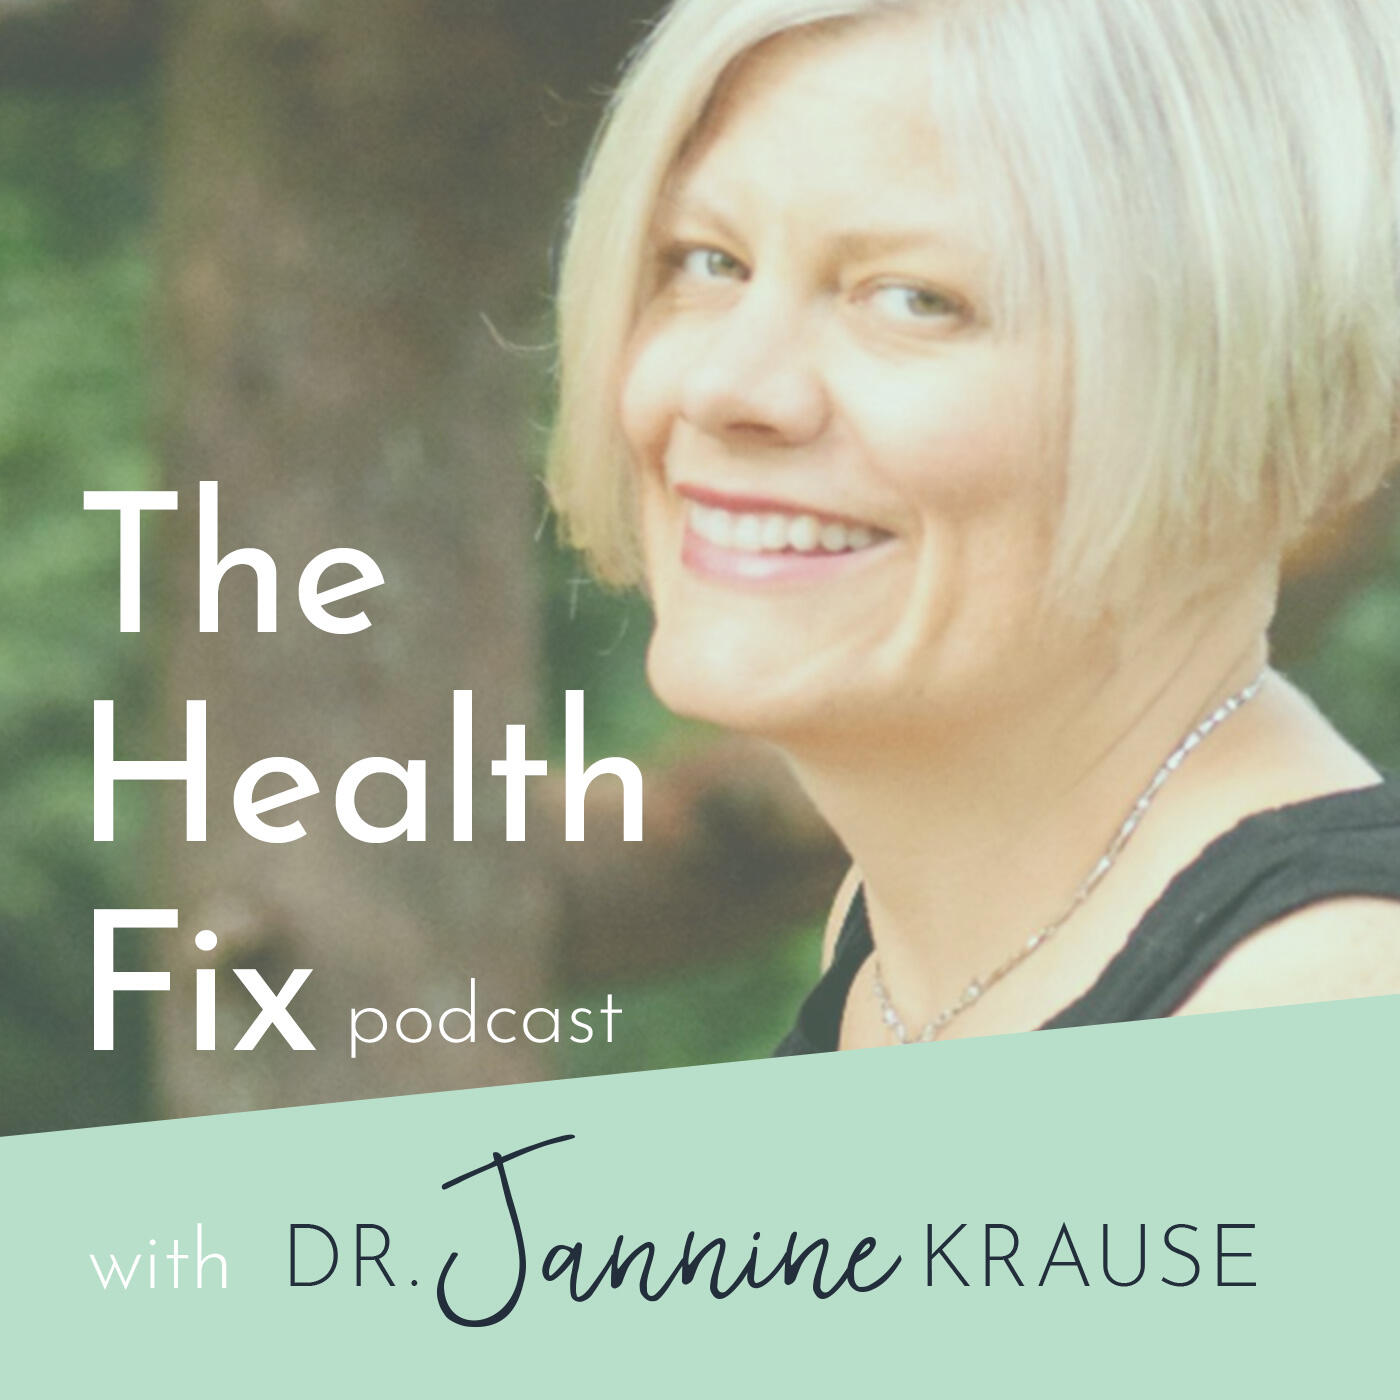 The Health Fix